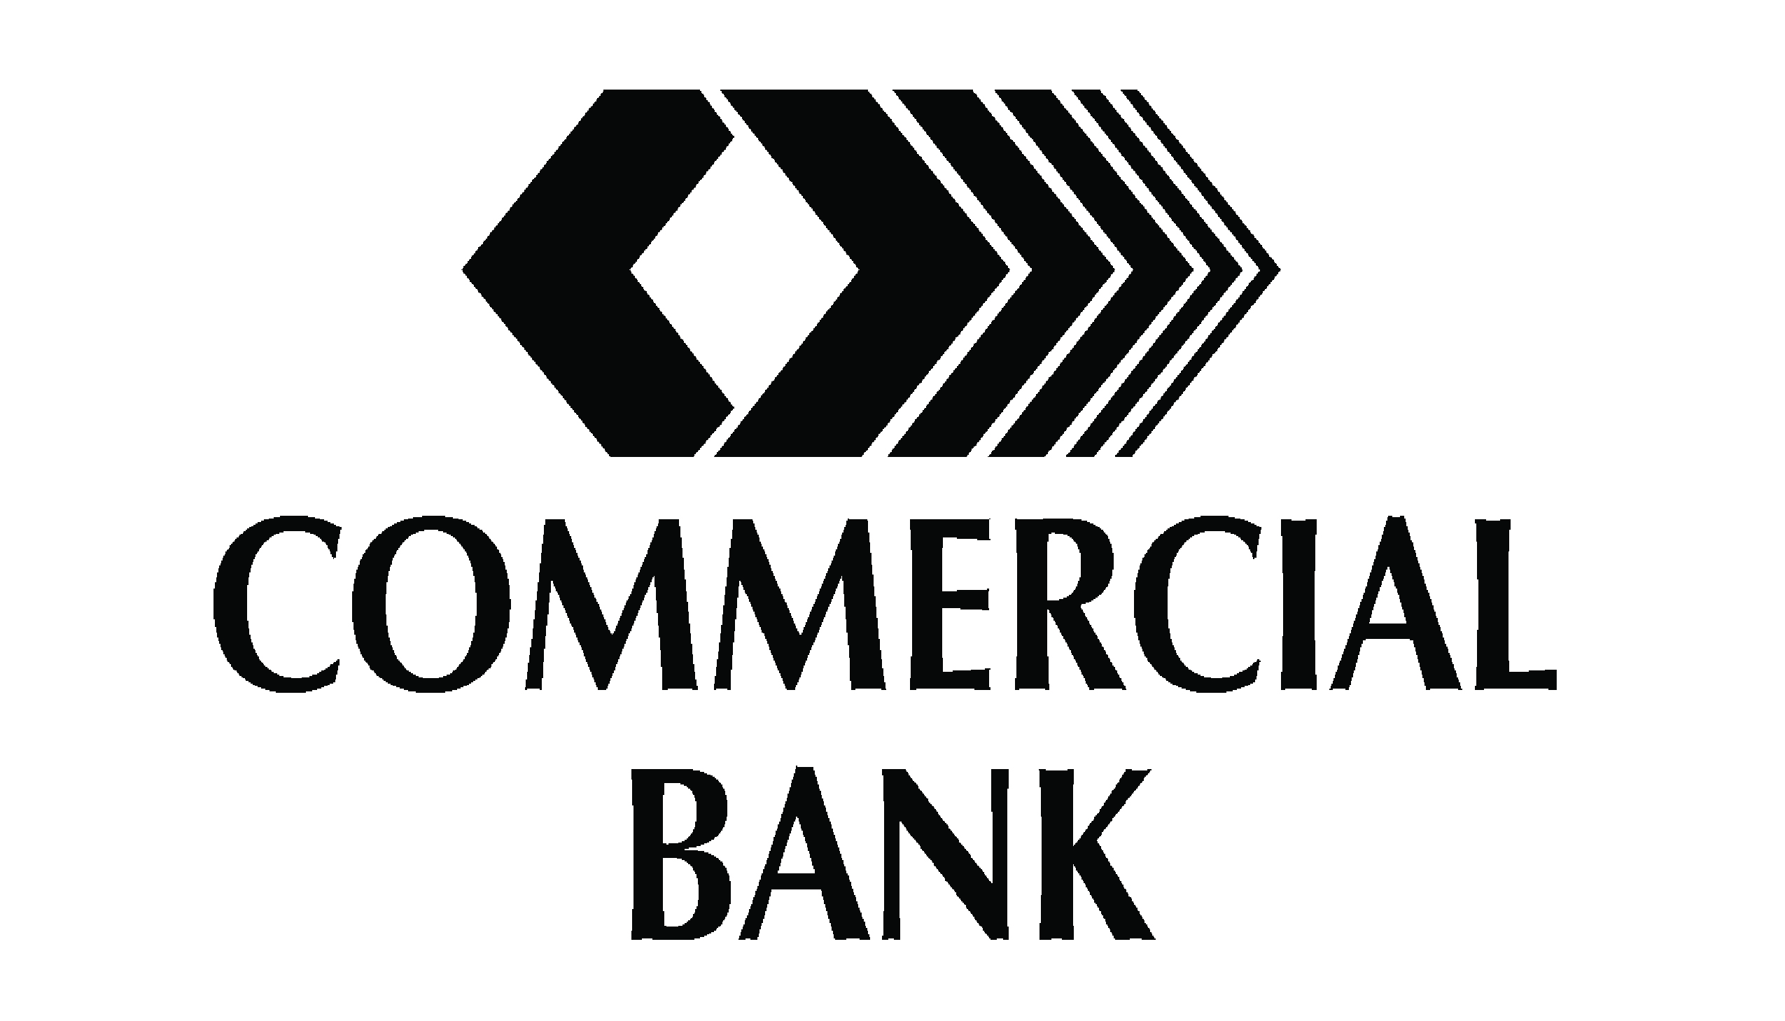 Commercial Bank logos-01